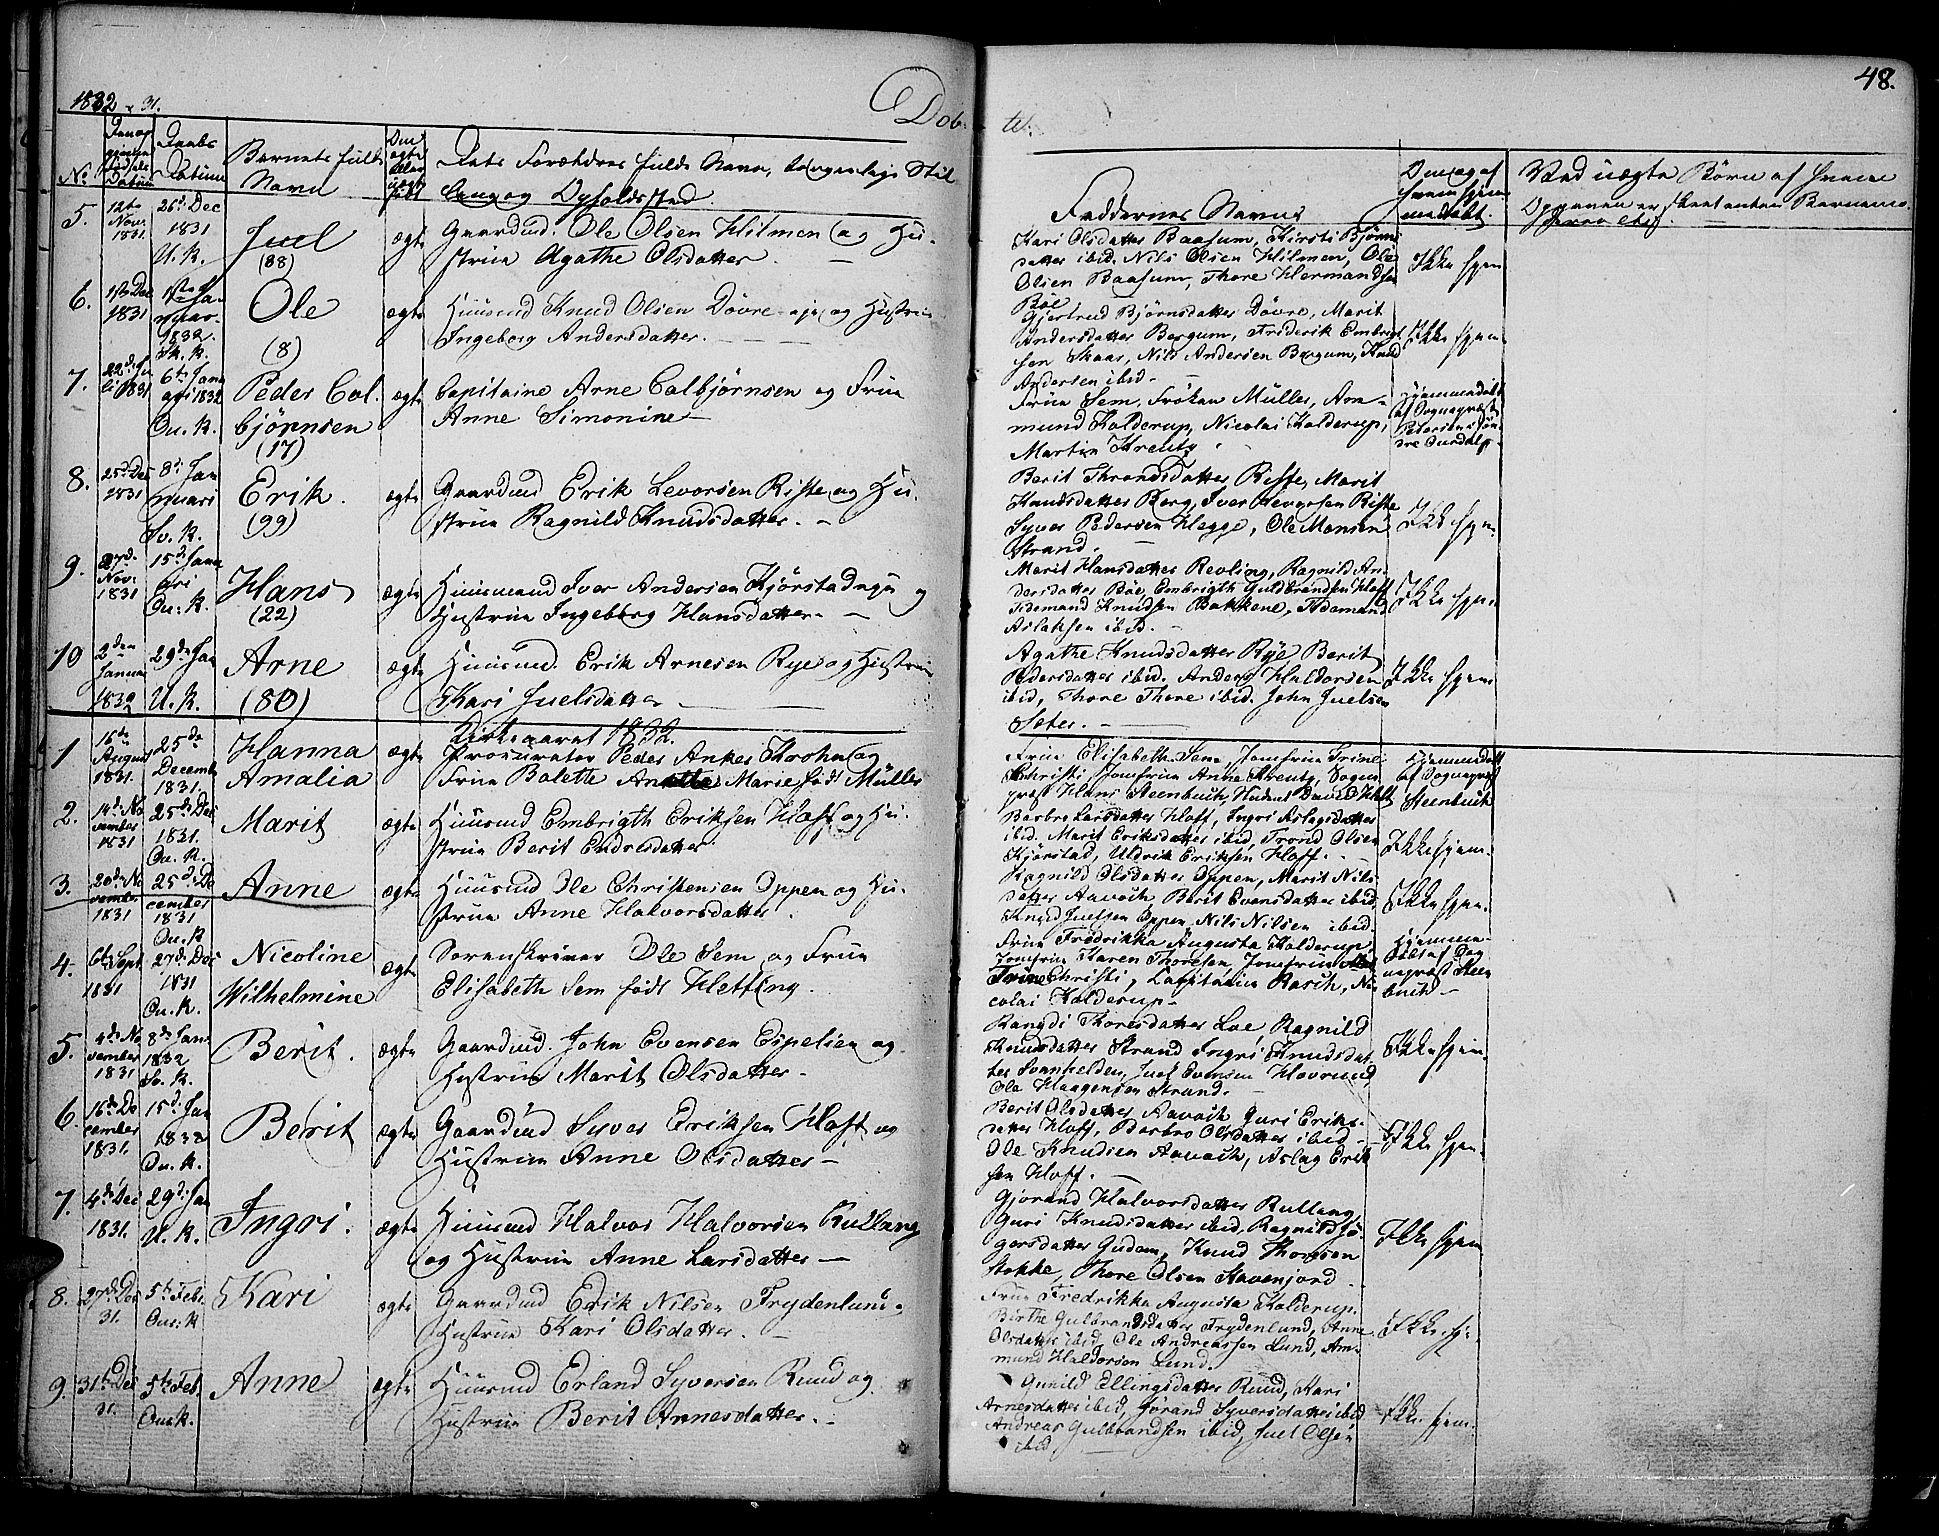 SAH, Nord-Aurdal prestekontor, Ministerialbok nr. 3, 1828-1841, s. 48